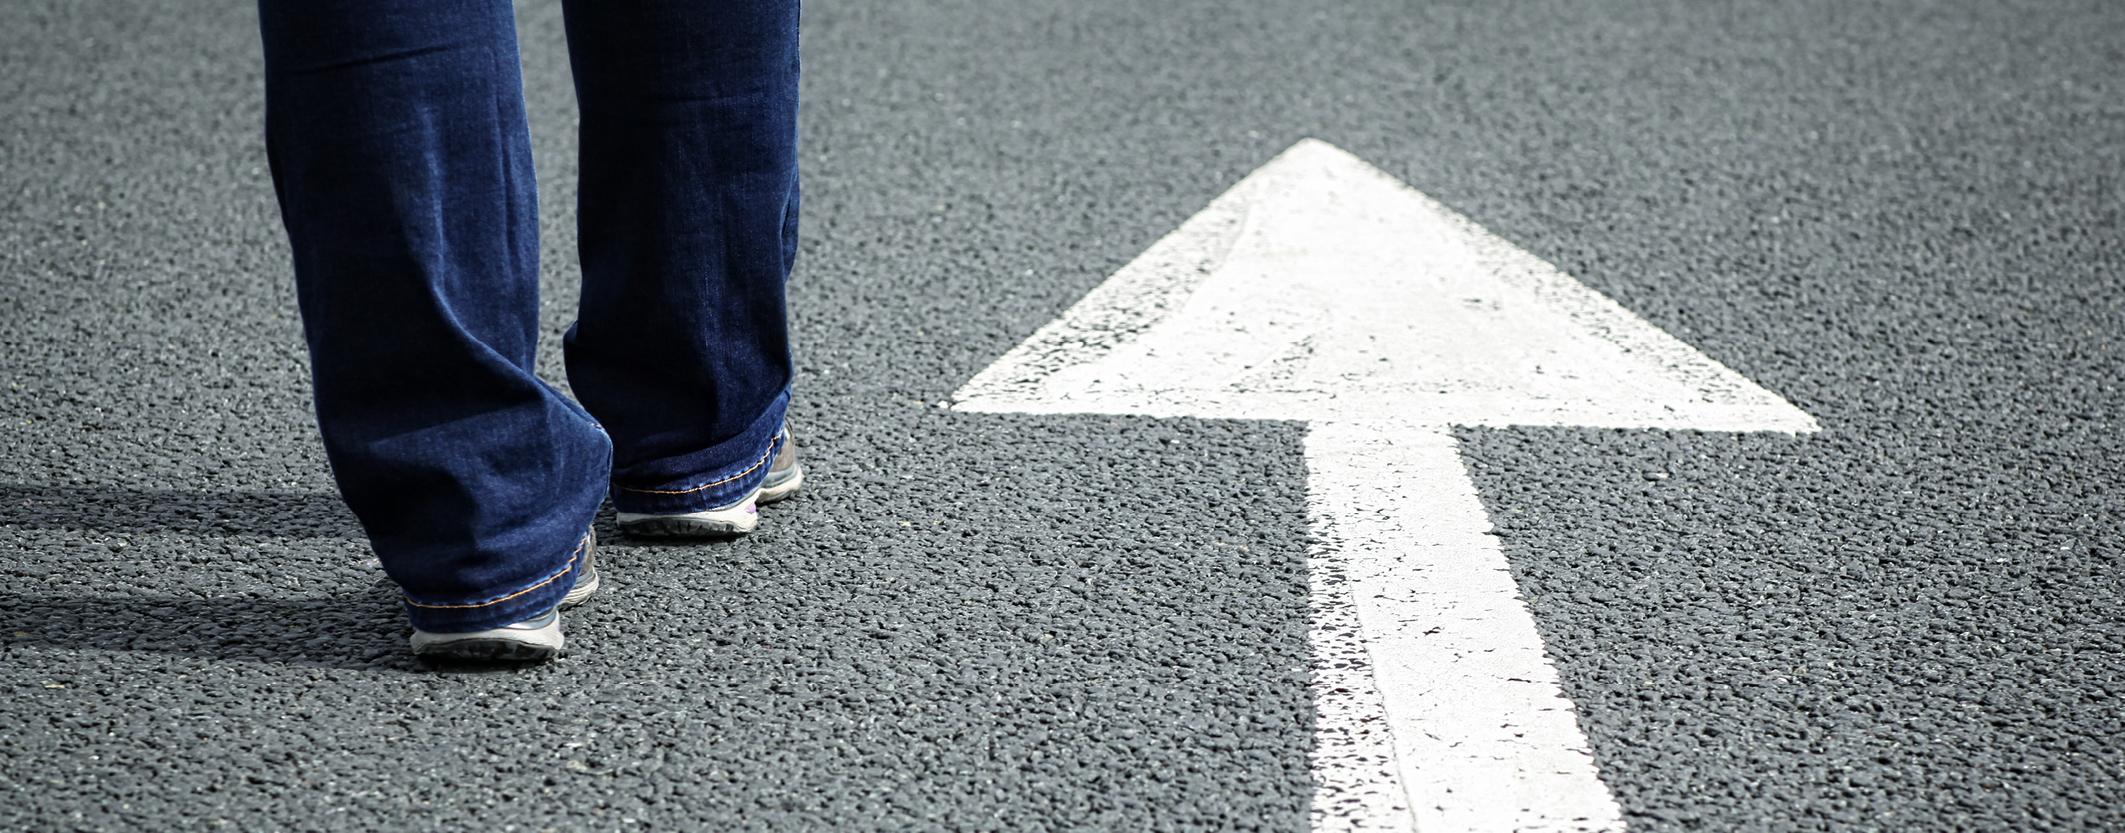 feet walking on road with white arrow